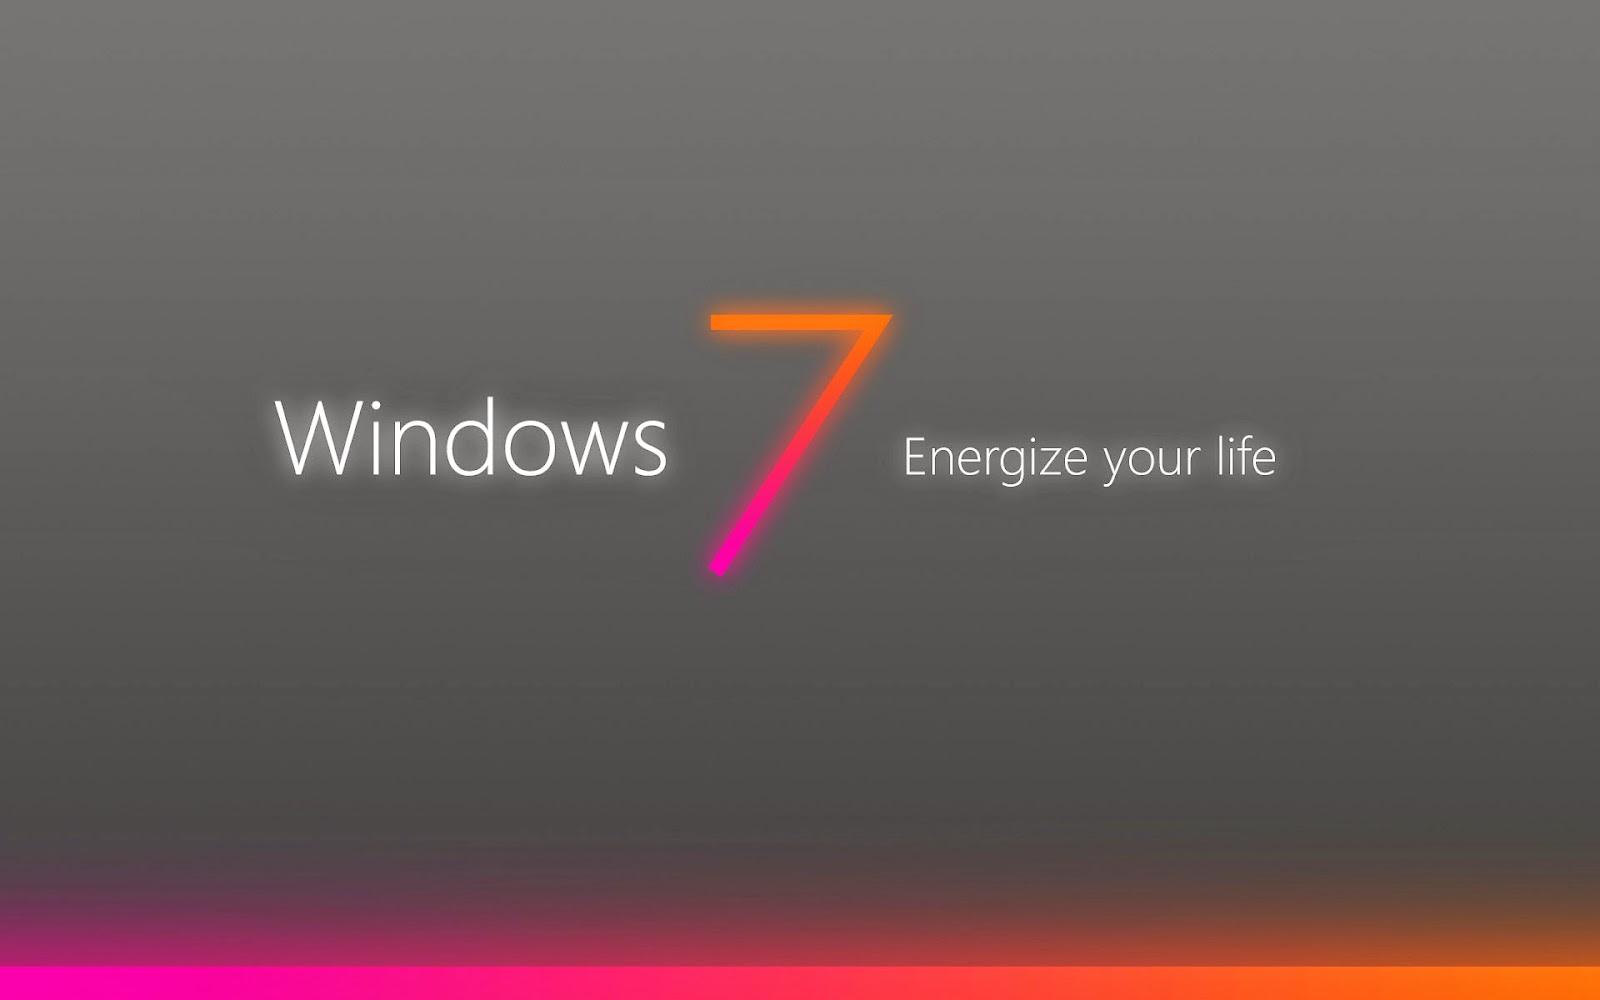 Windows 7 wallpapers hd 3d for desktop 50 wallpapers for Fenetre 3d windows 7